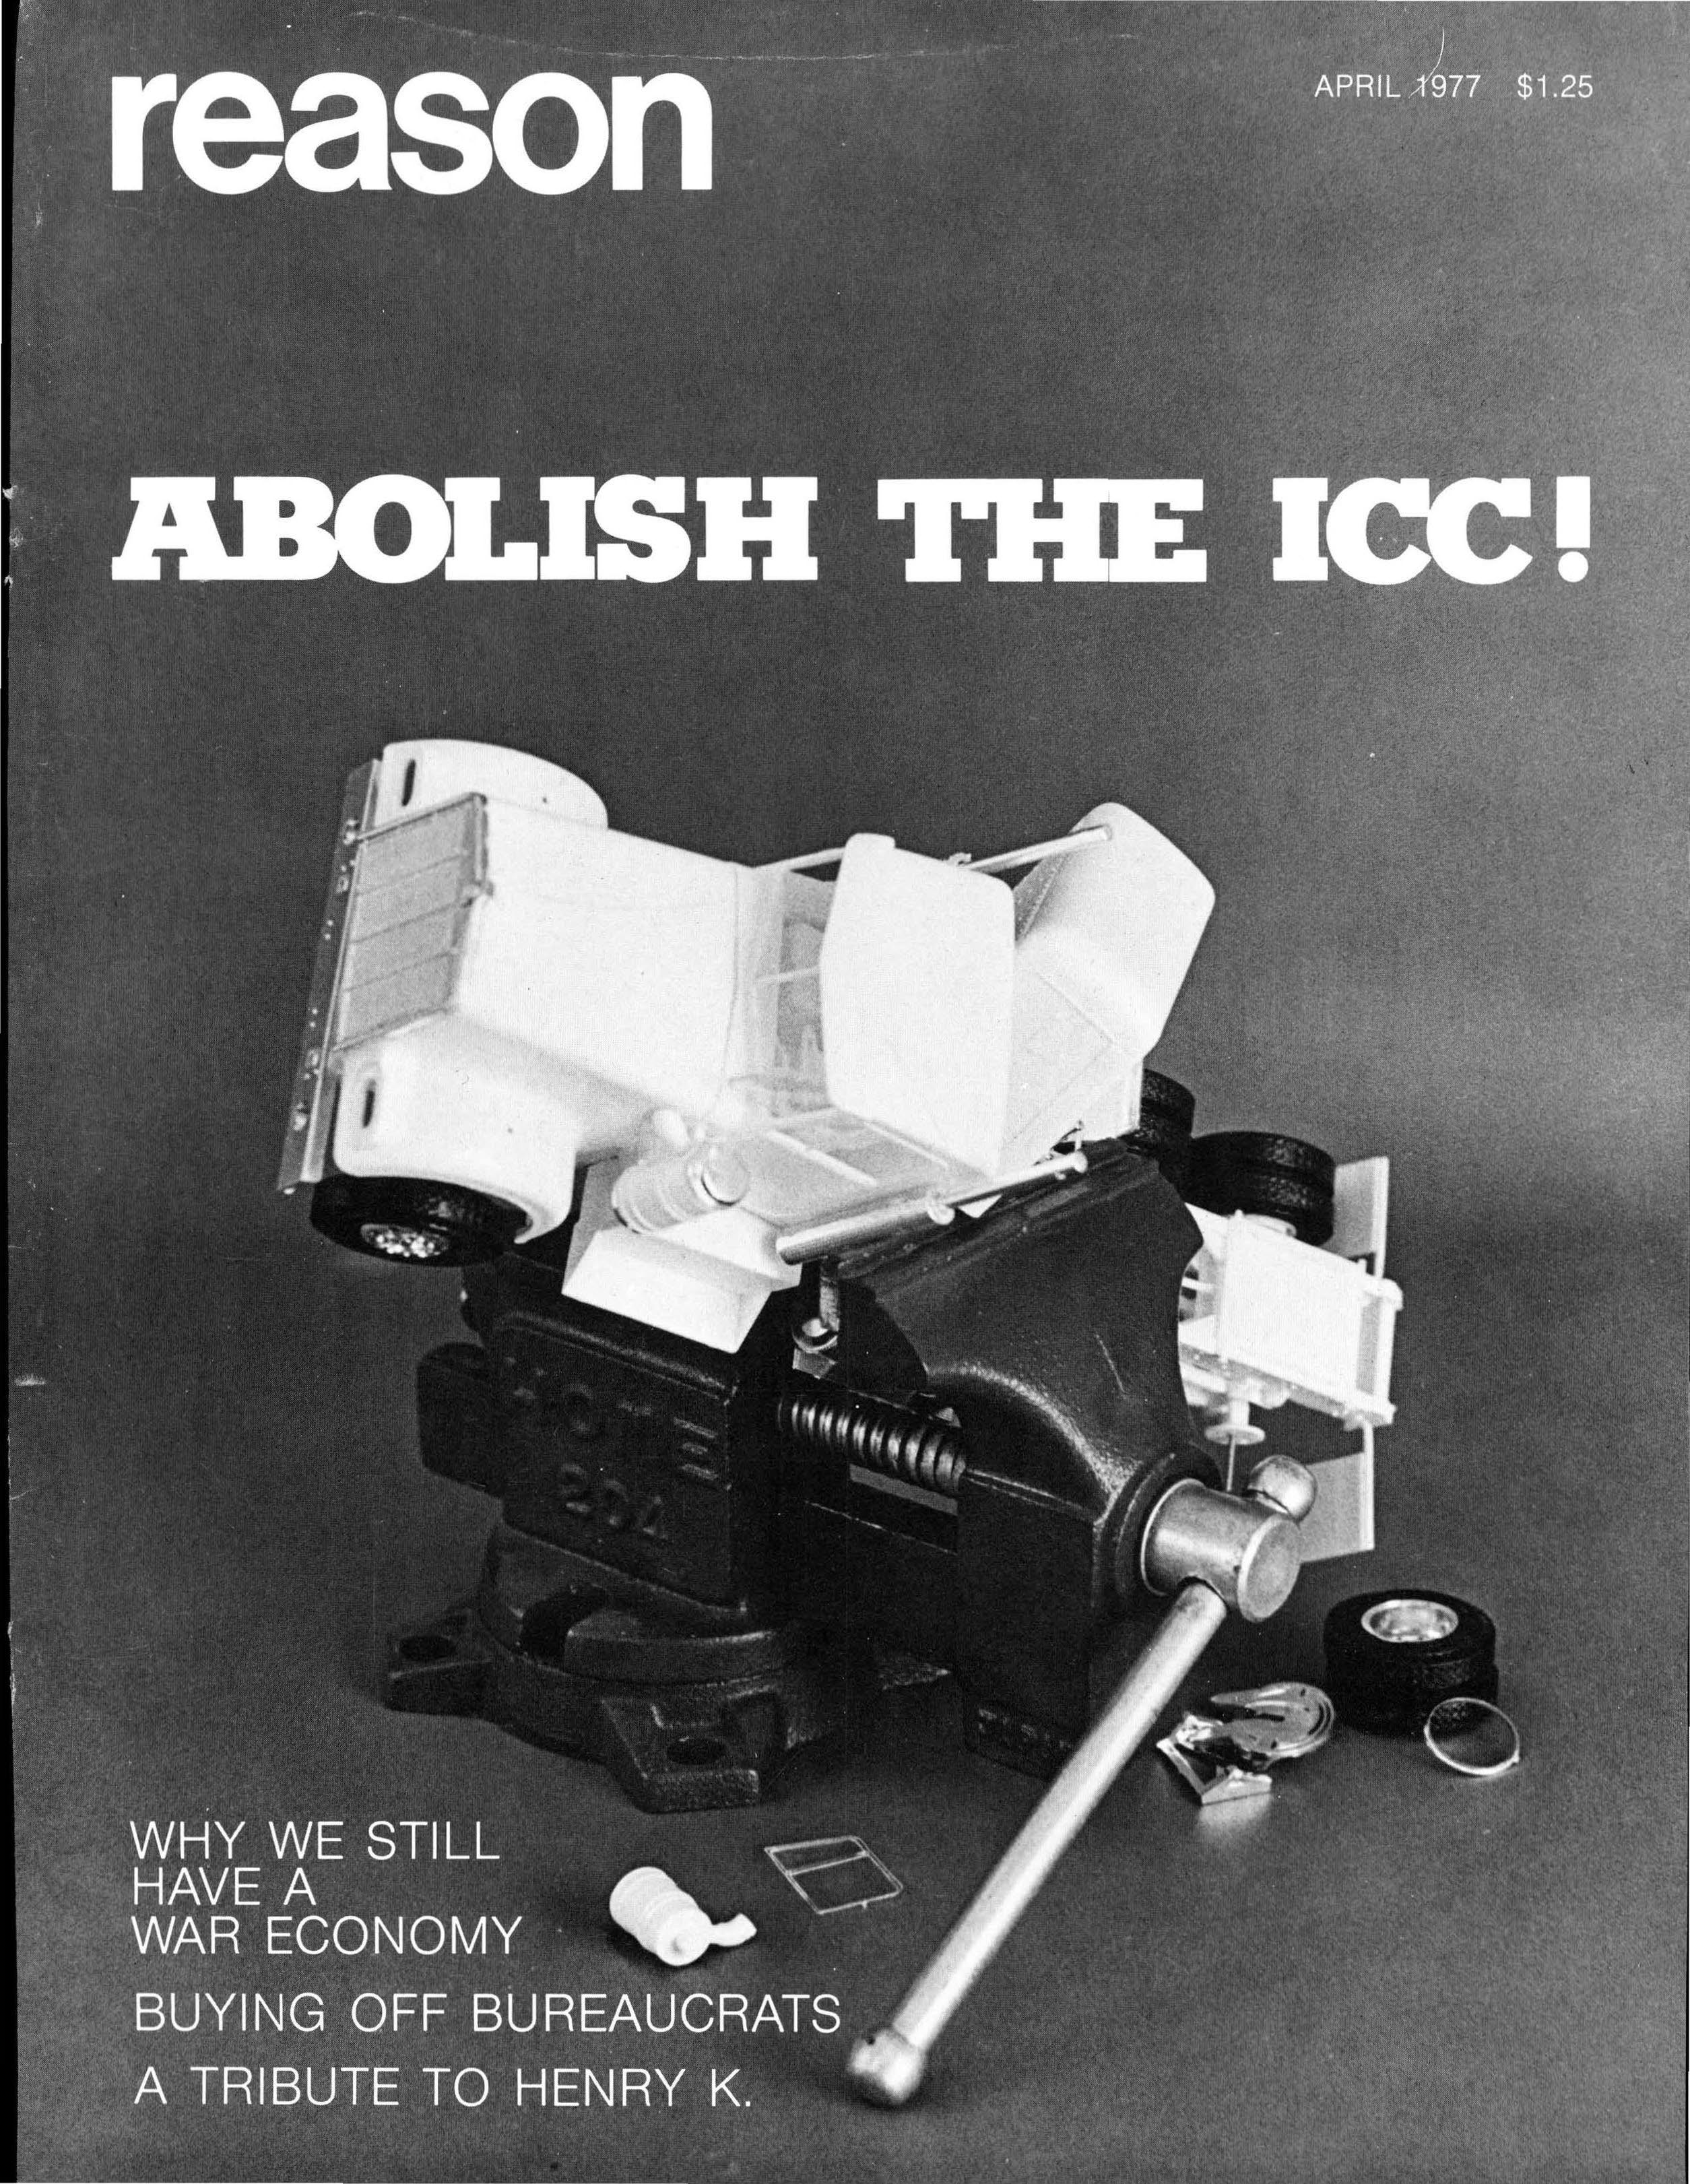 Reason Magazine, April 1977 cover image